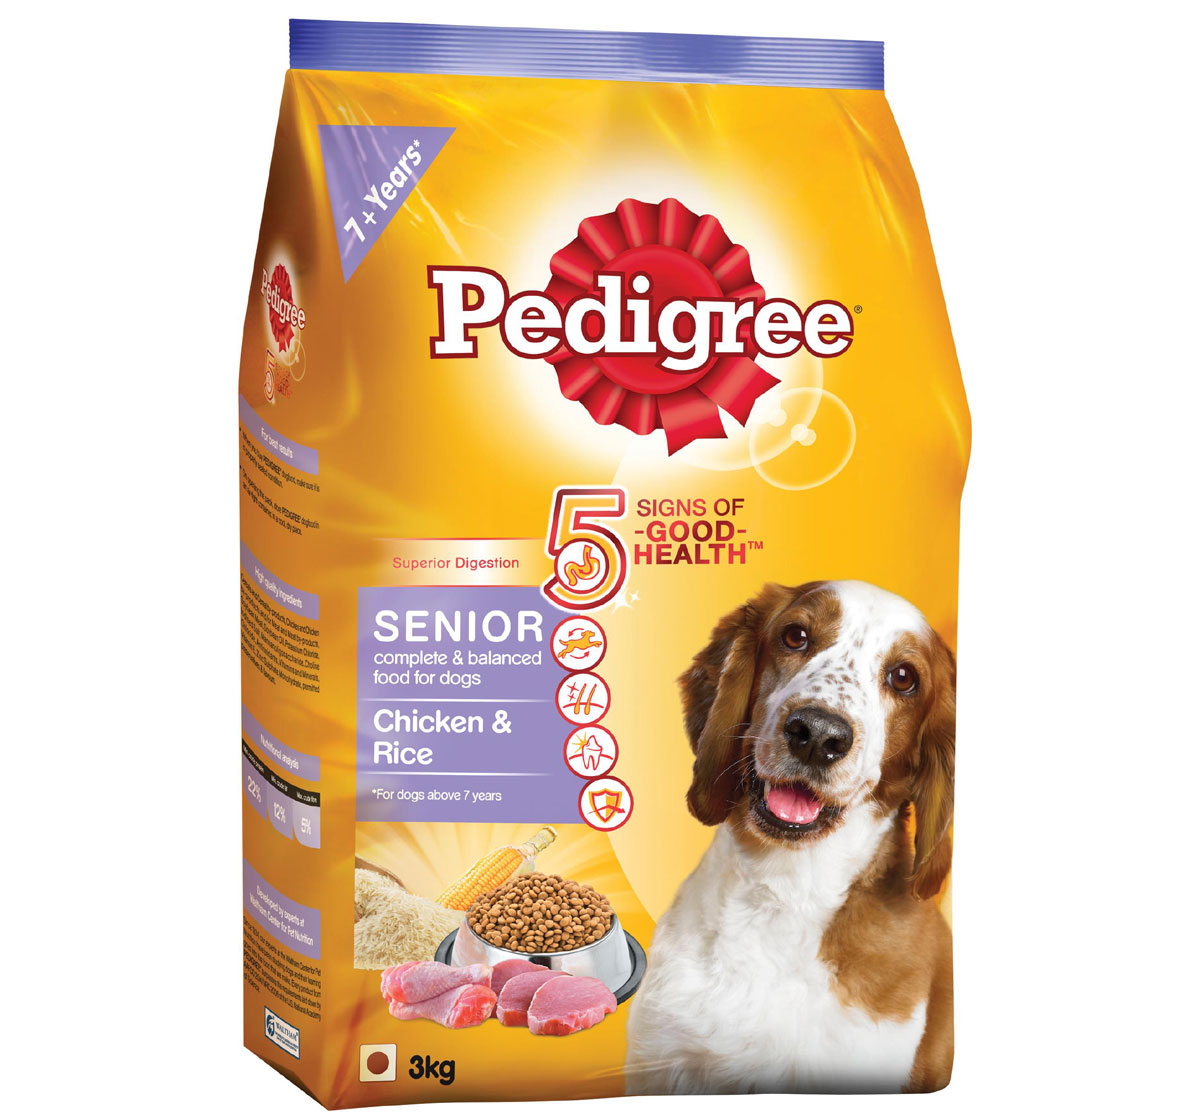 Names Of Purina Dog Food